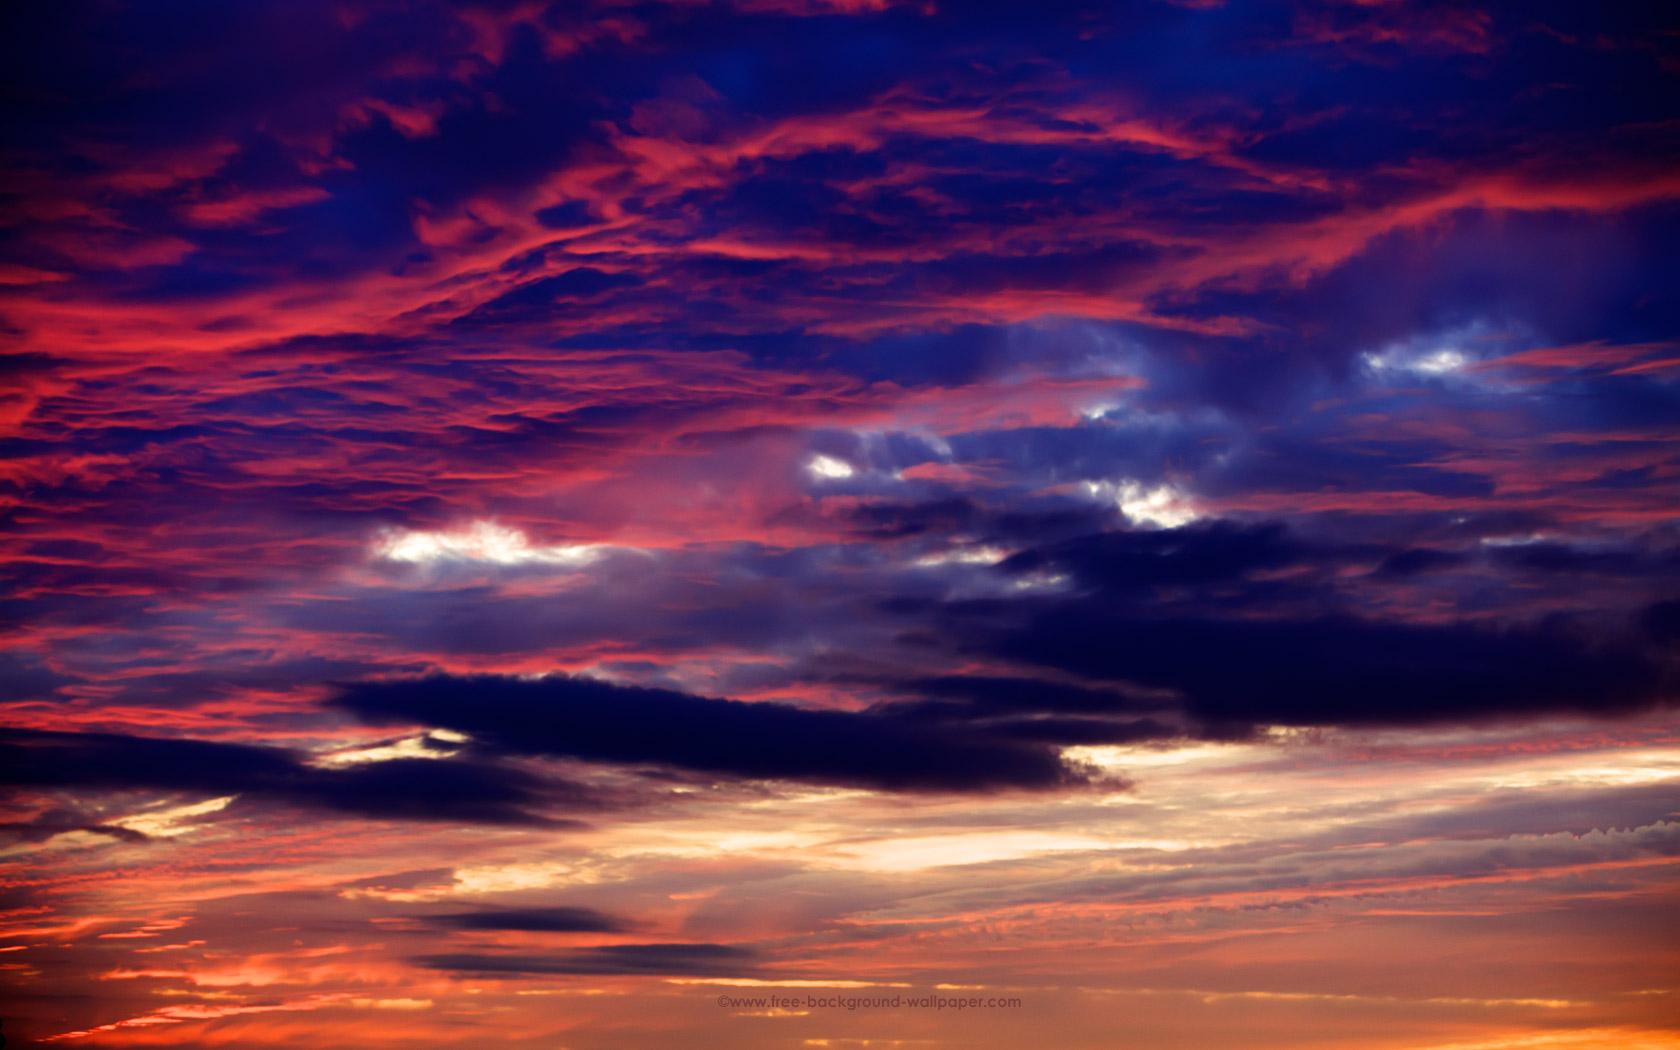 Beautiful Sky After Sunset Sky Background Wallpaper   1680x1050 pixels 1680x1050